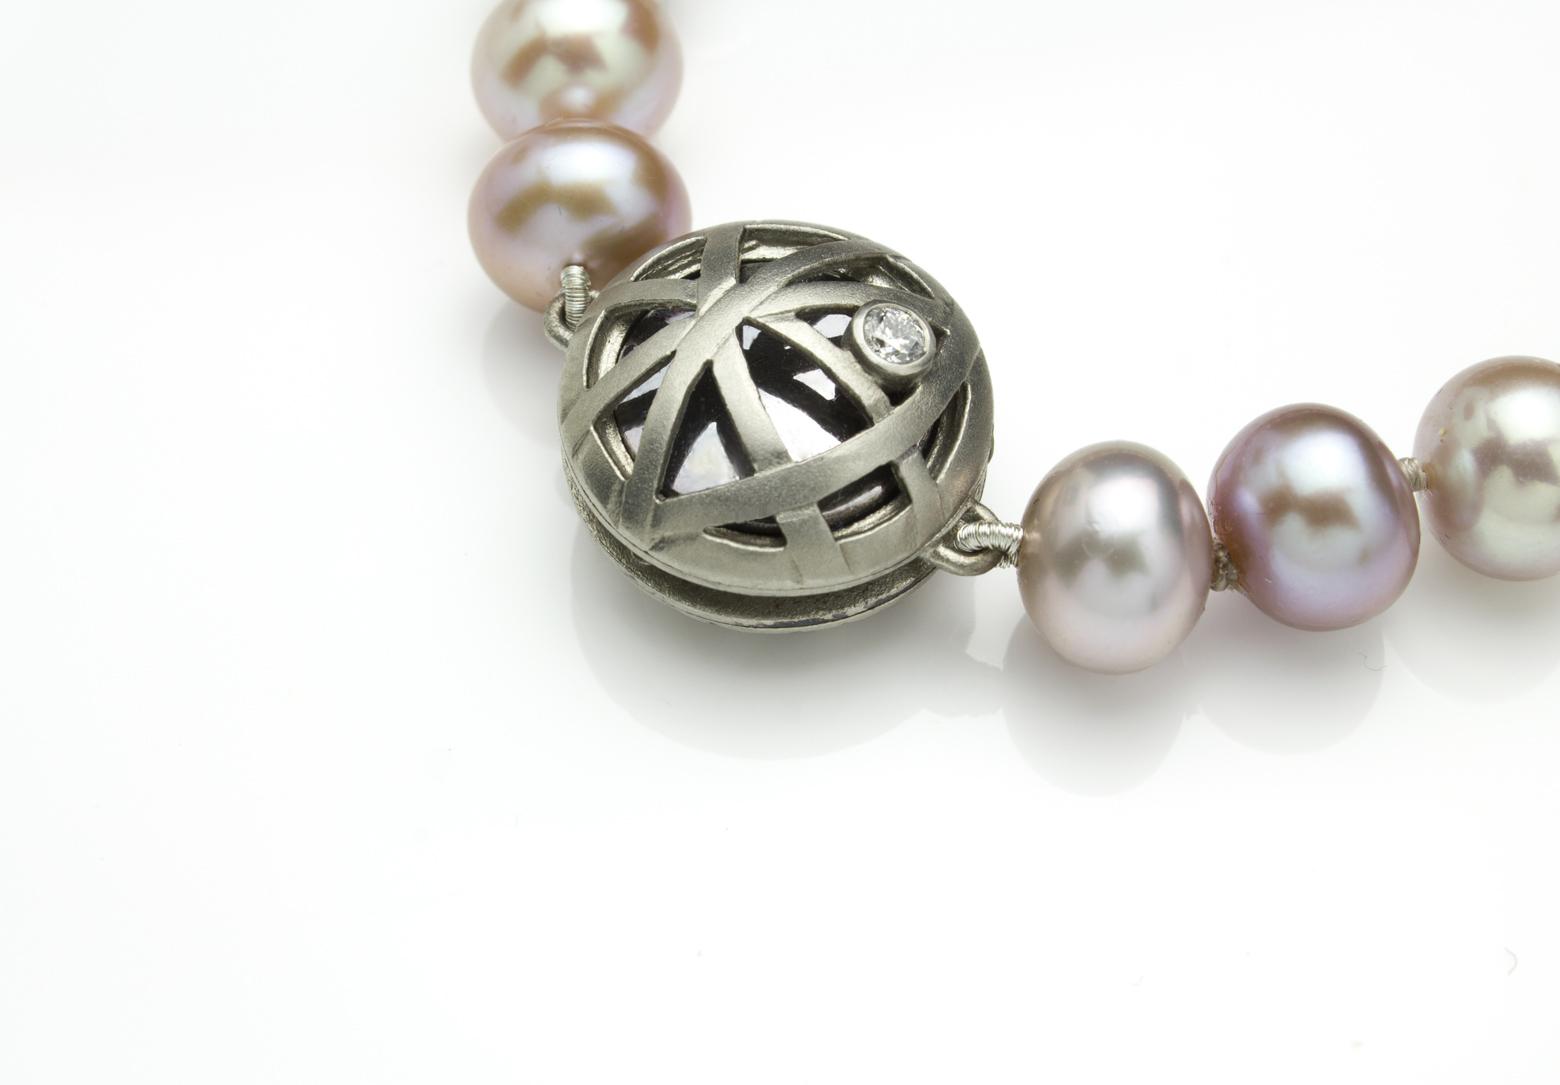 Palladium Pearls | Martyn Pugh - Goldsmith & Silversmith